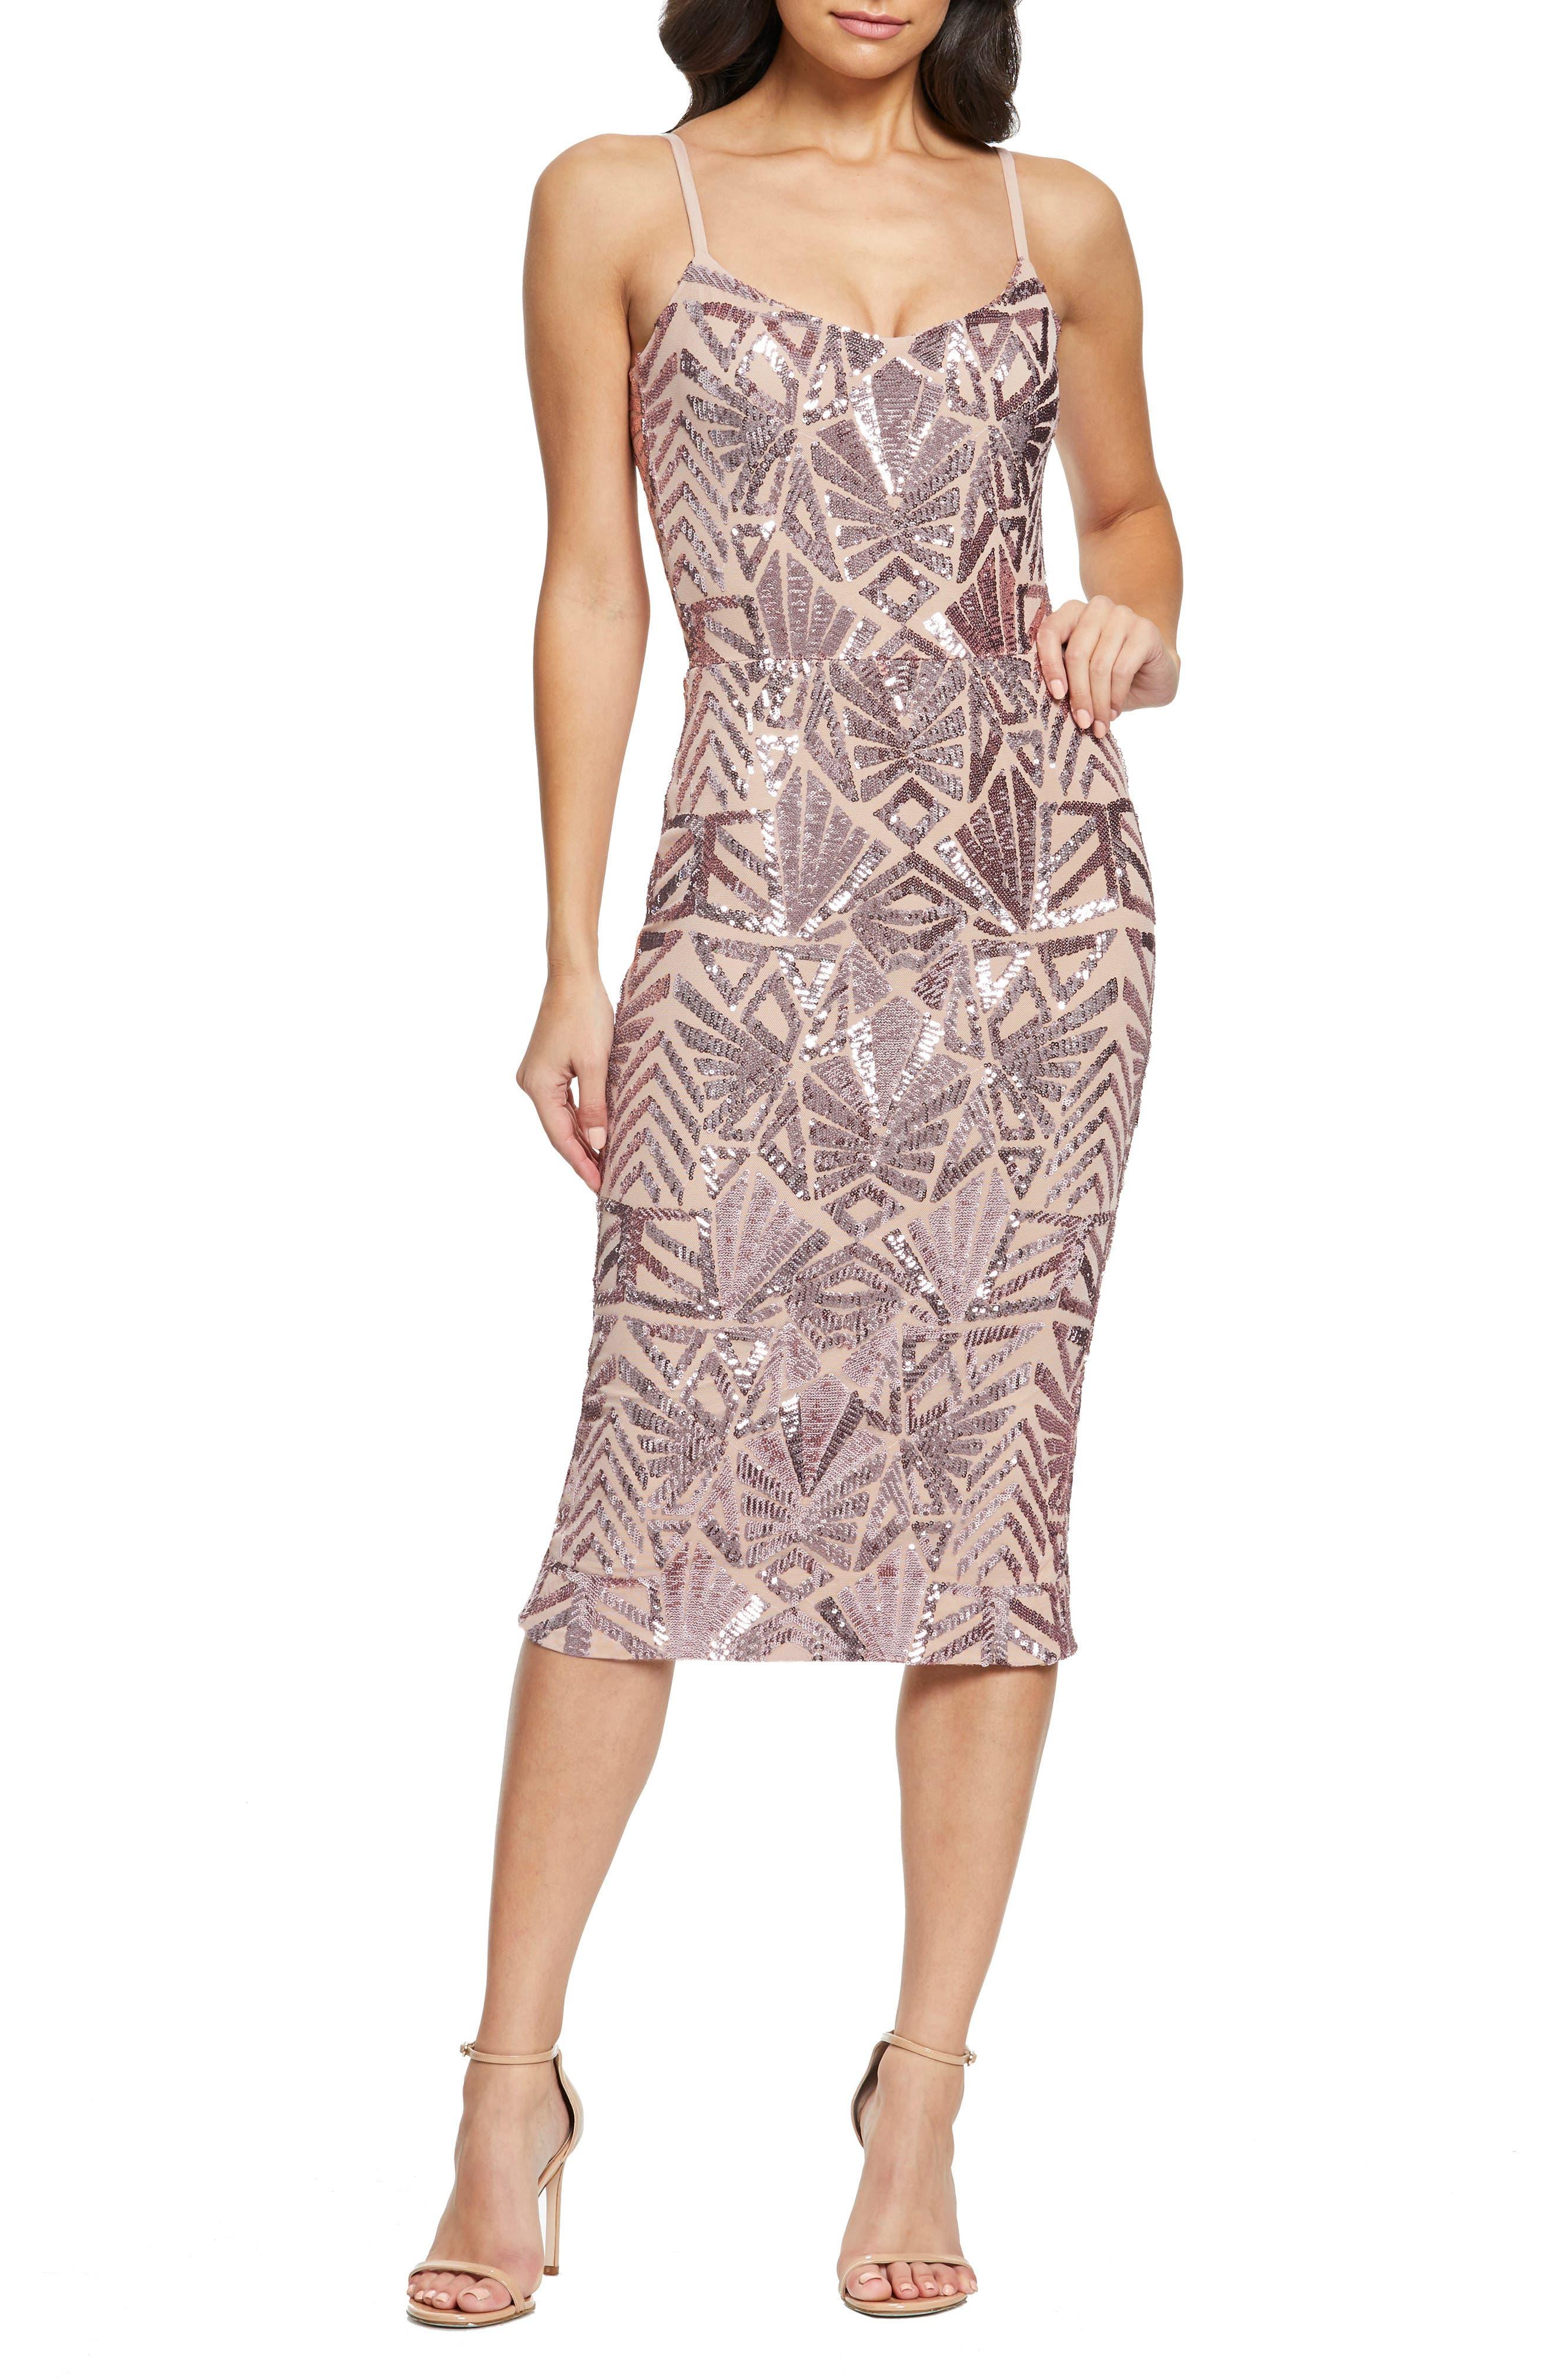 1960s – 70s Cocktail, Party, Prom, Evening Dresses Womens Dress The Population Alexa Sequin Cocktail Dress $248.00 AT vintagedancer.com